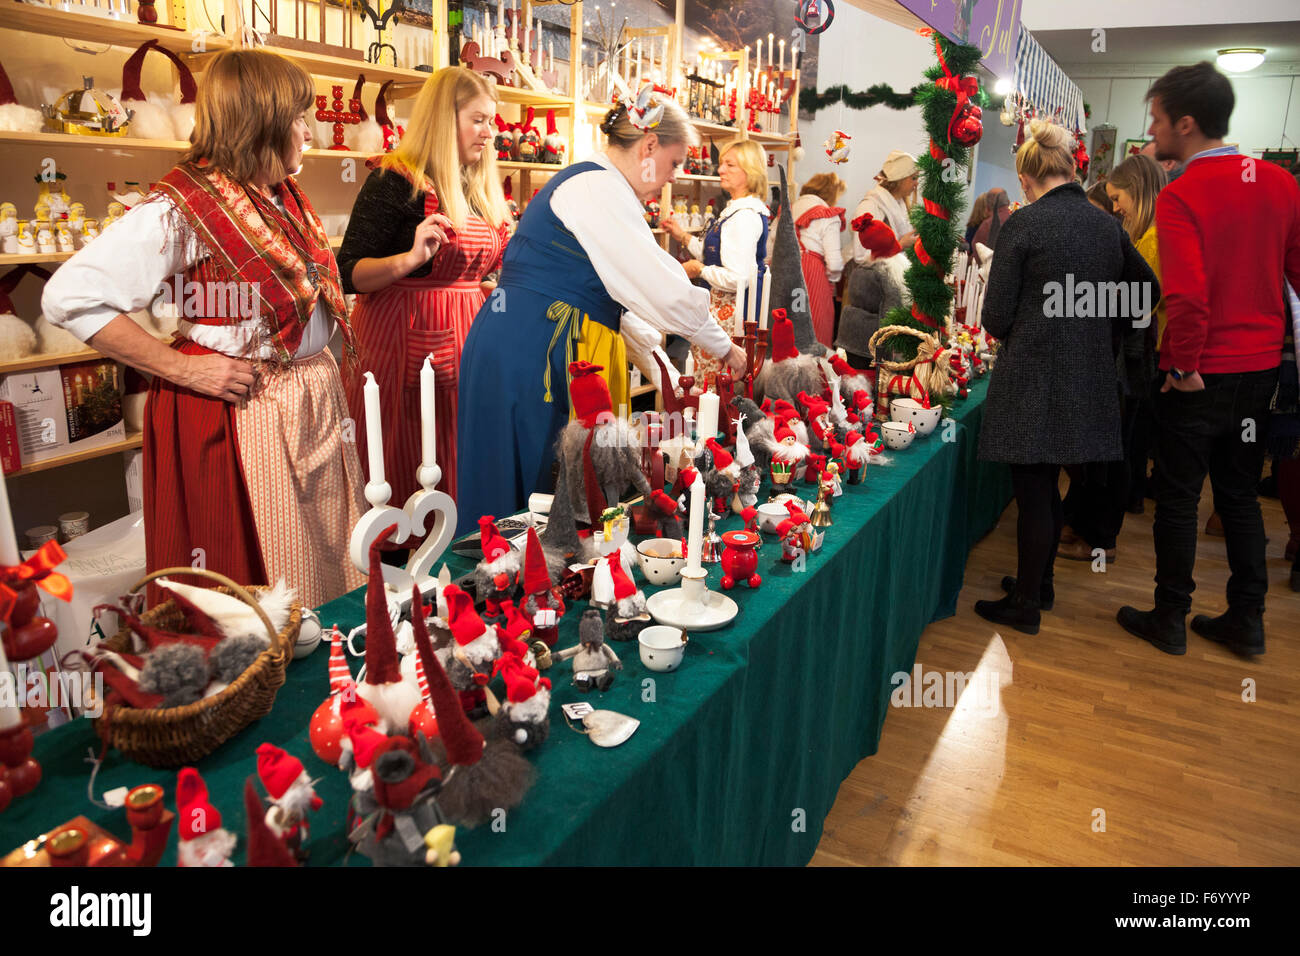 London, UK. 22nd November 2015. Crowds attend this year's Swedish Christmas Market at the Swedish Church. Market - Stock Image